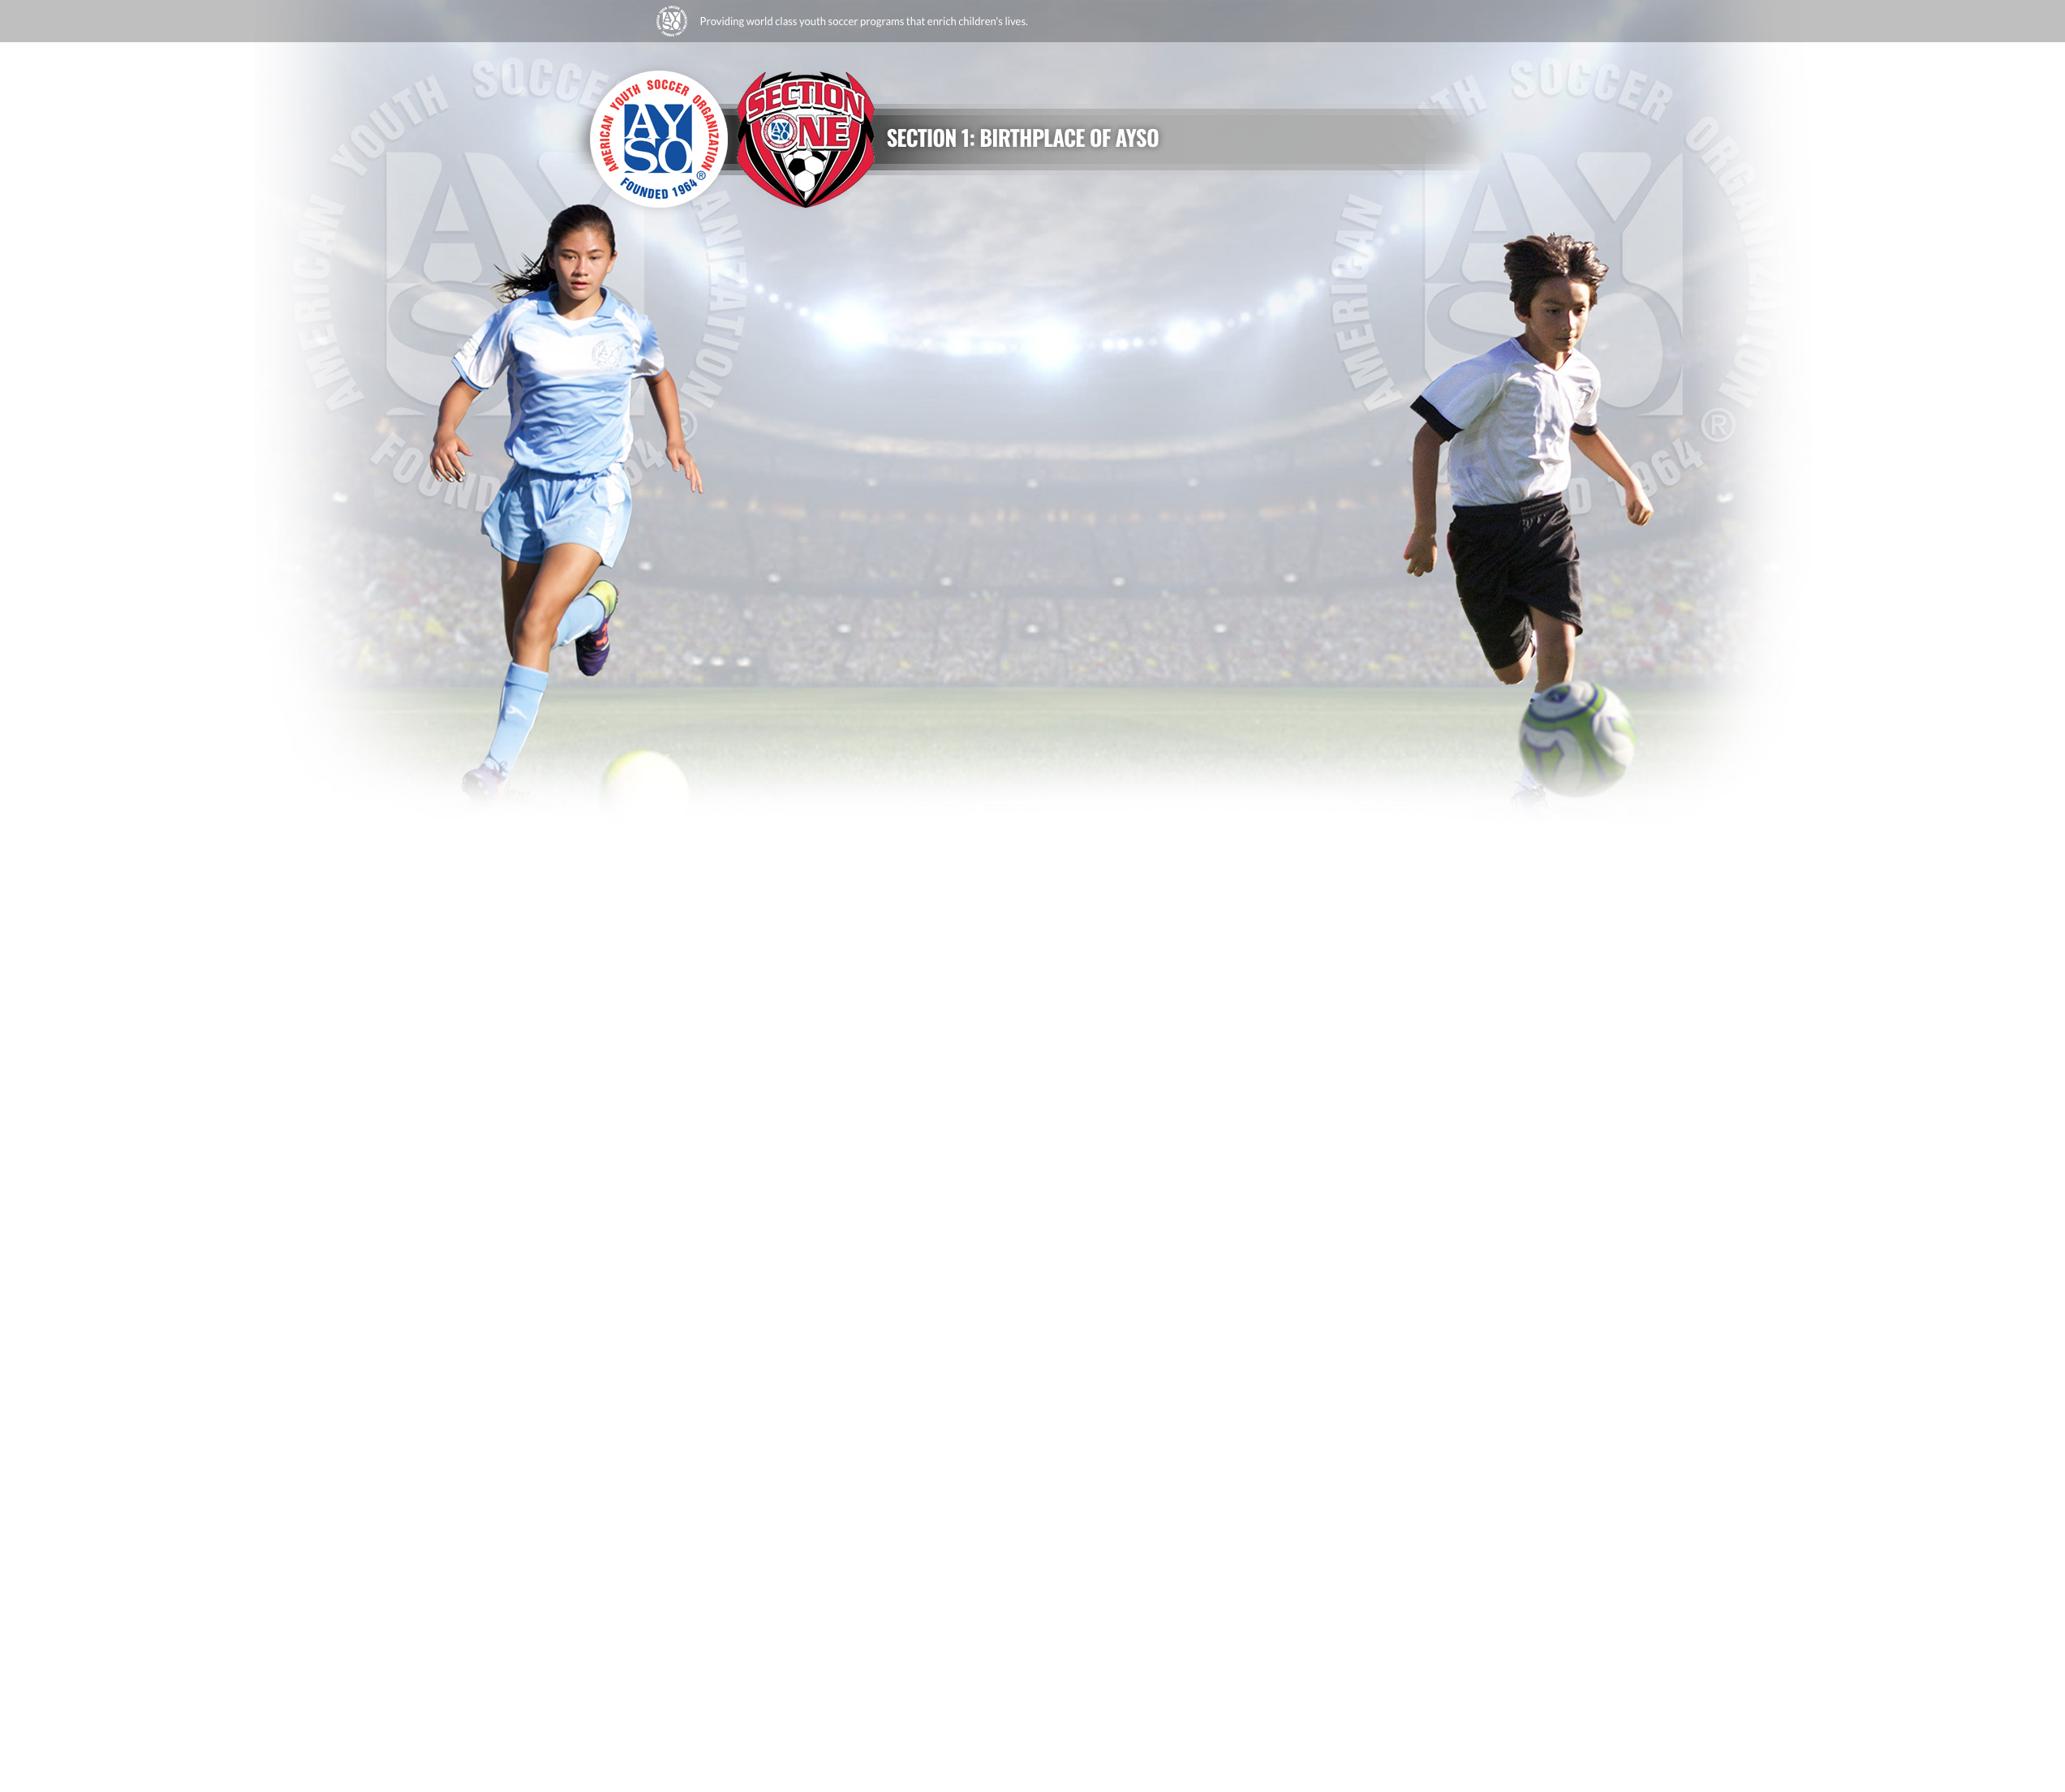 ayso-bg.2019 - AYSO Section 1: Referees